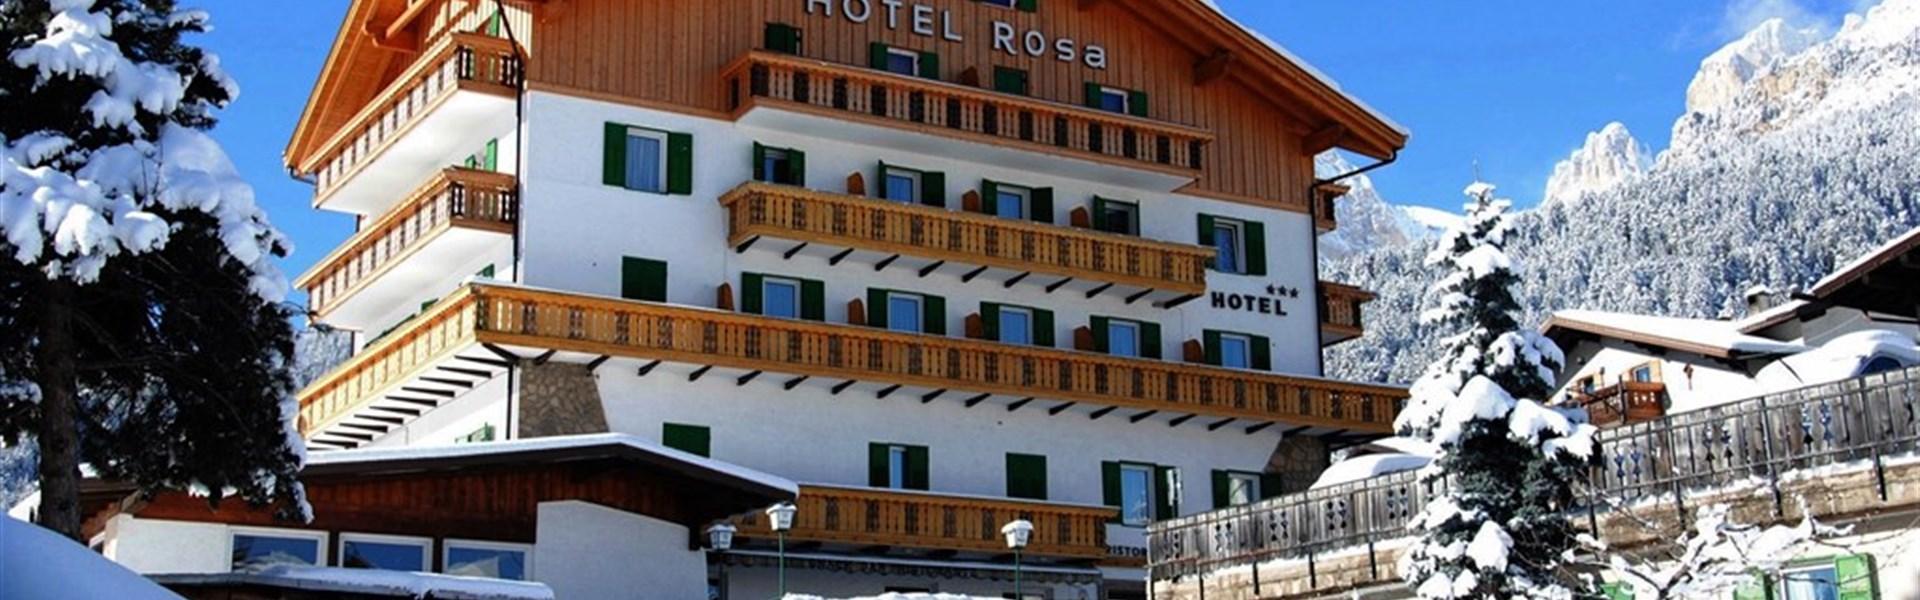 Marco Polo - Hotel Rosa -